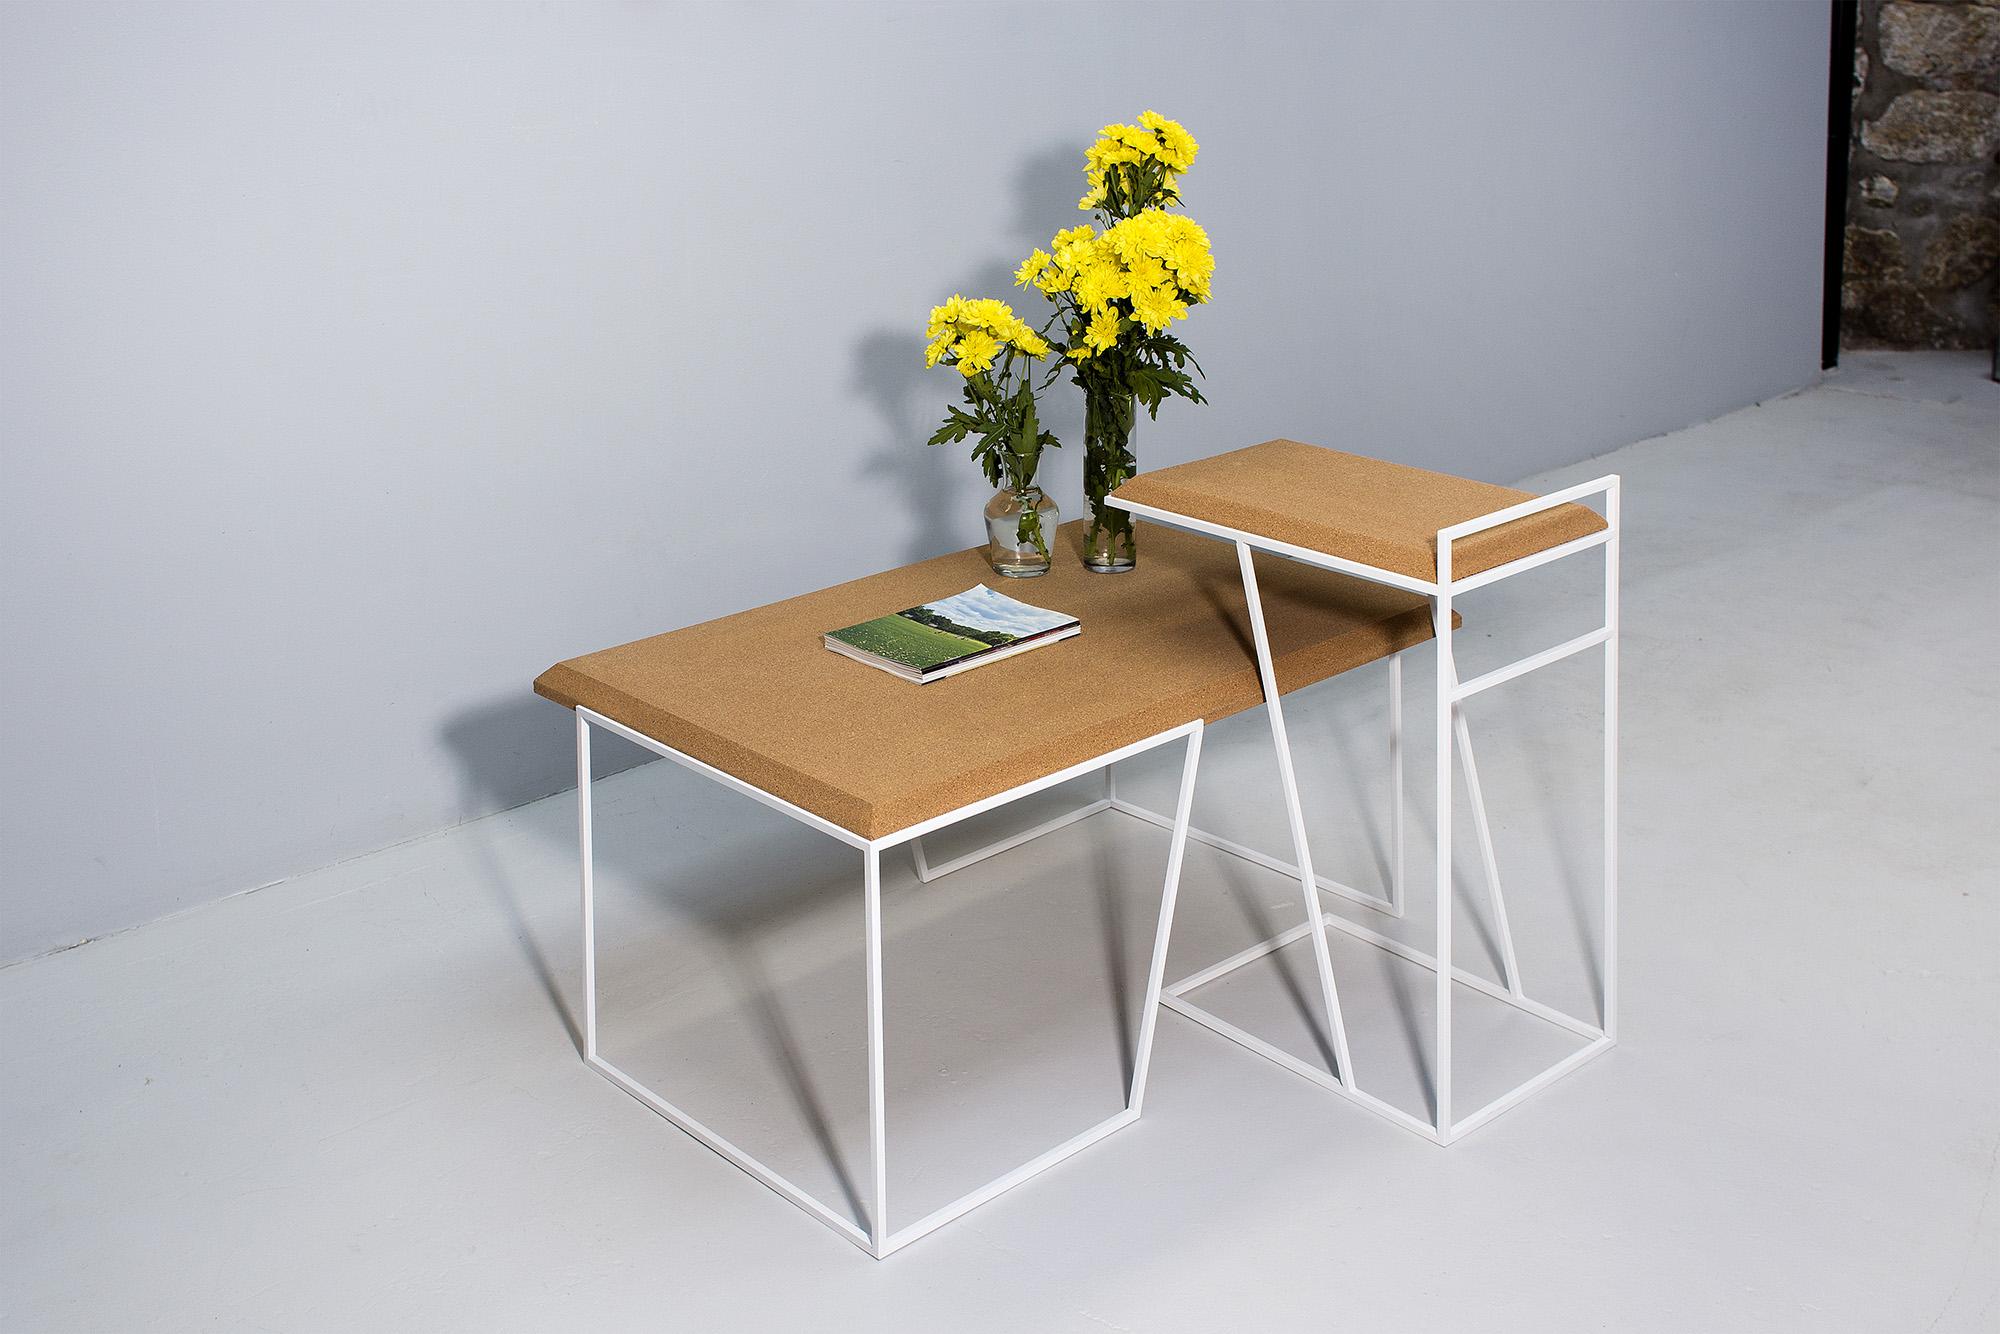 galula-grao-side-table-light-cork-white-amb-4.jpg